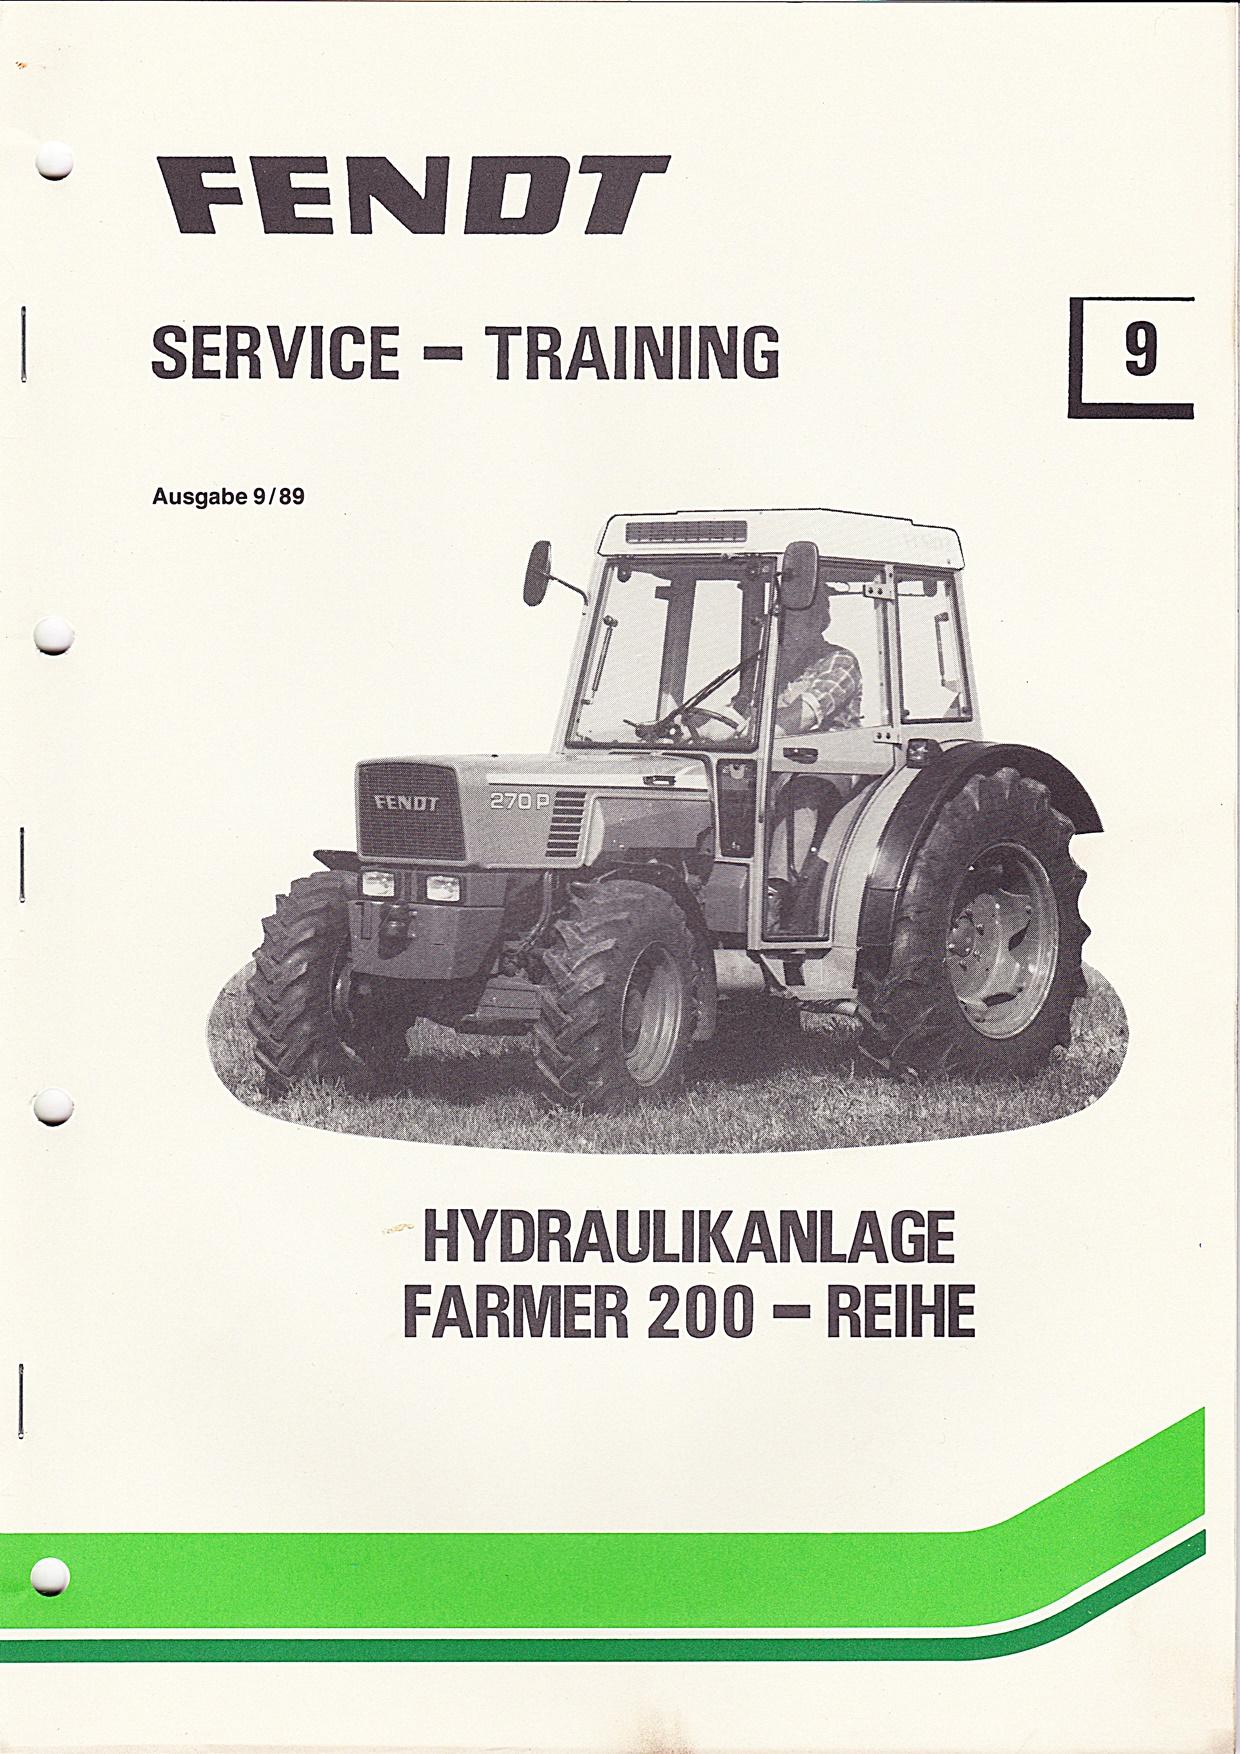 Fendt Service und Training Nr. 9 Hydraulikanlage Farmer 200 - Reihe